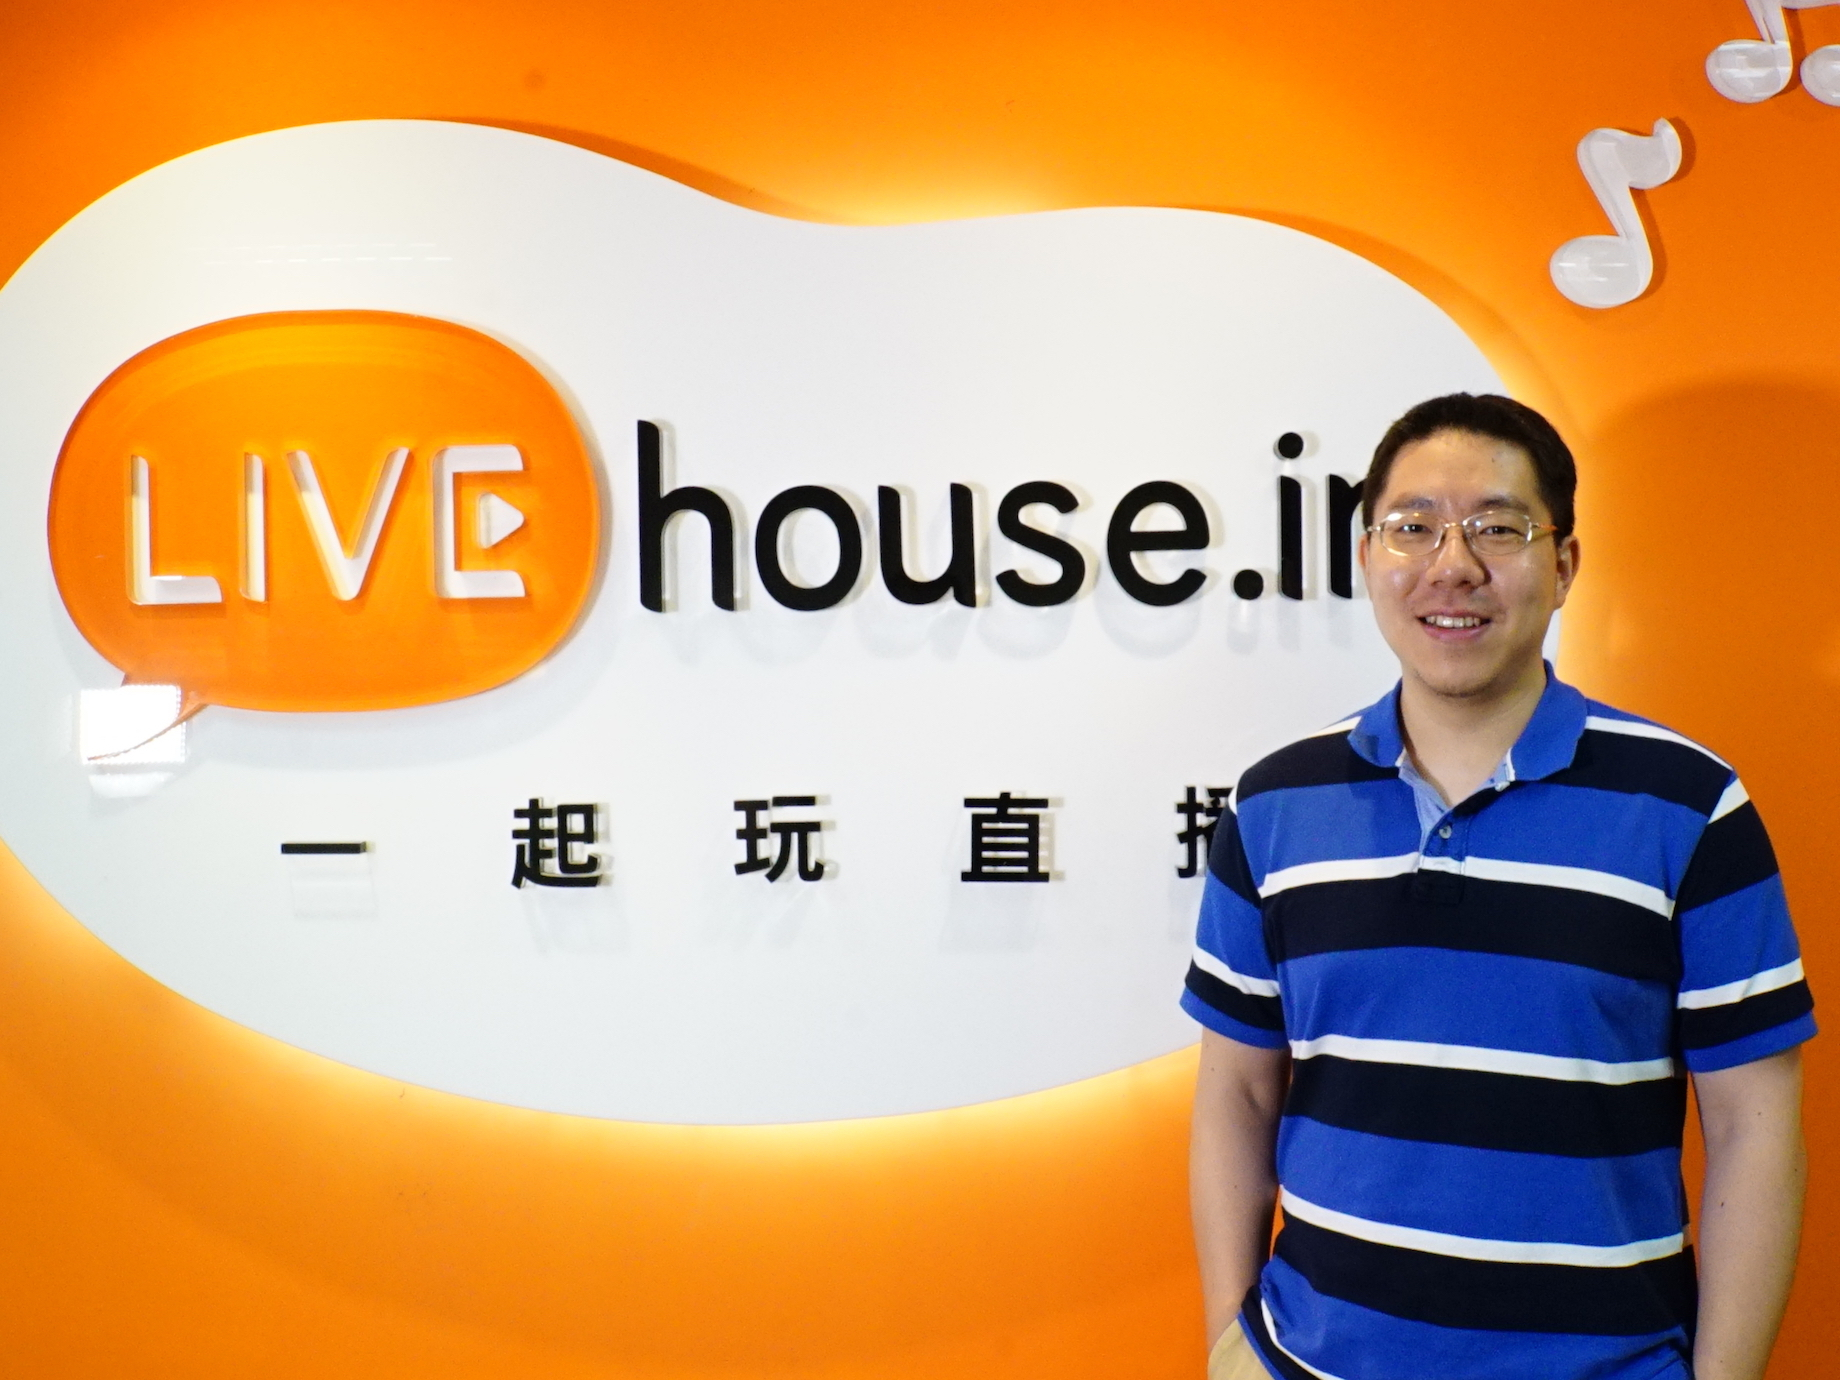 SmartM網路人才學》 LIVEhouse.in熱門職缺:社群經理、業務企劃、軟體工程師